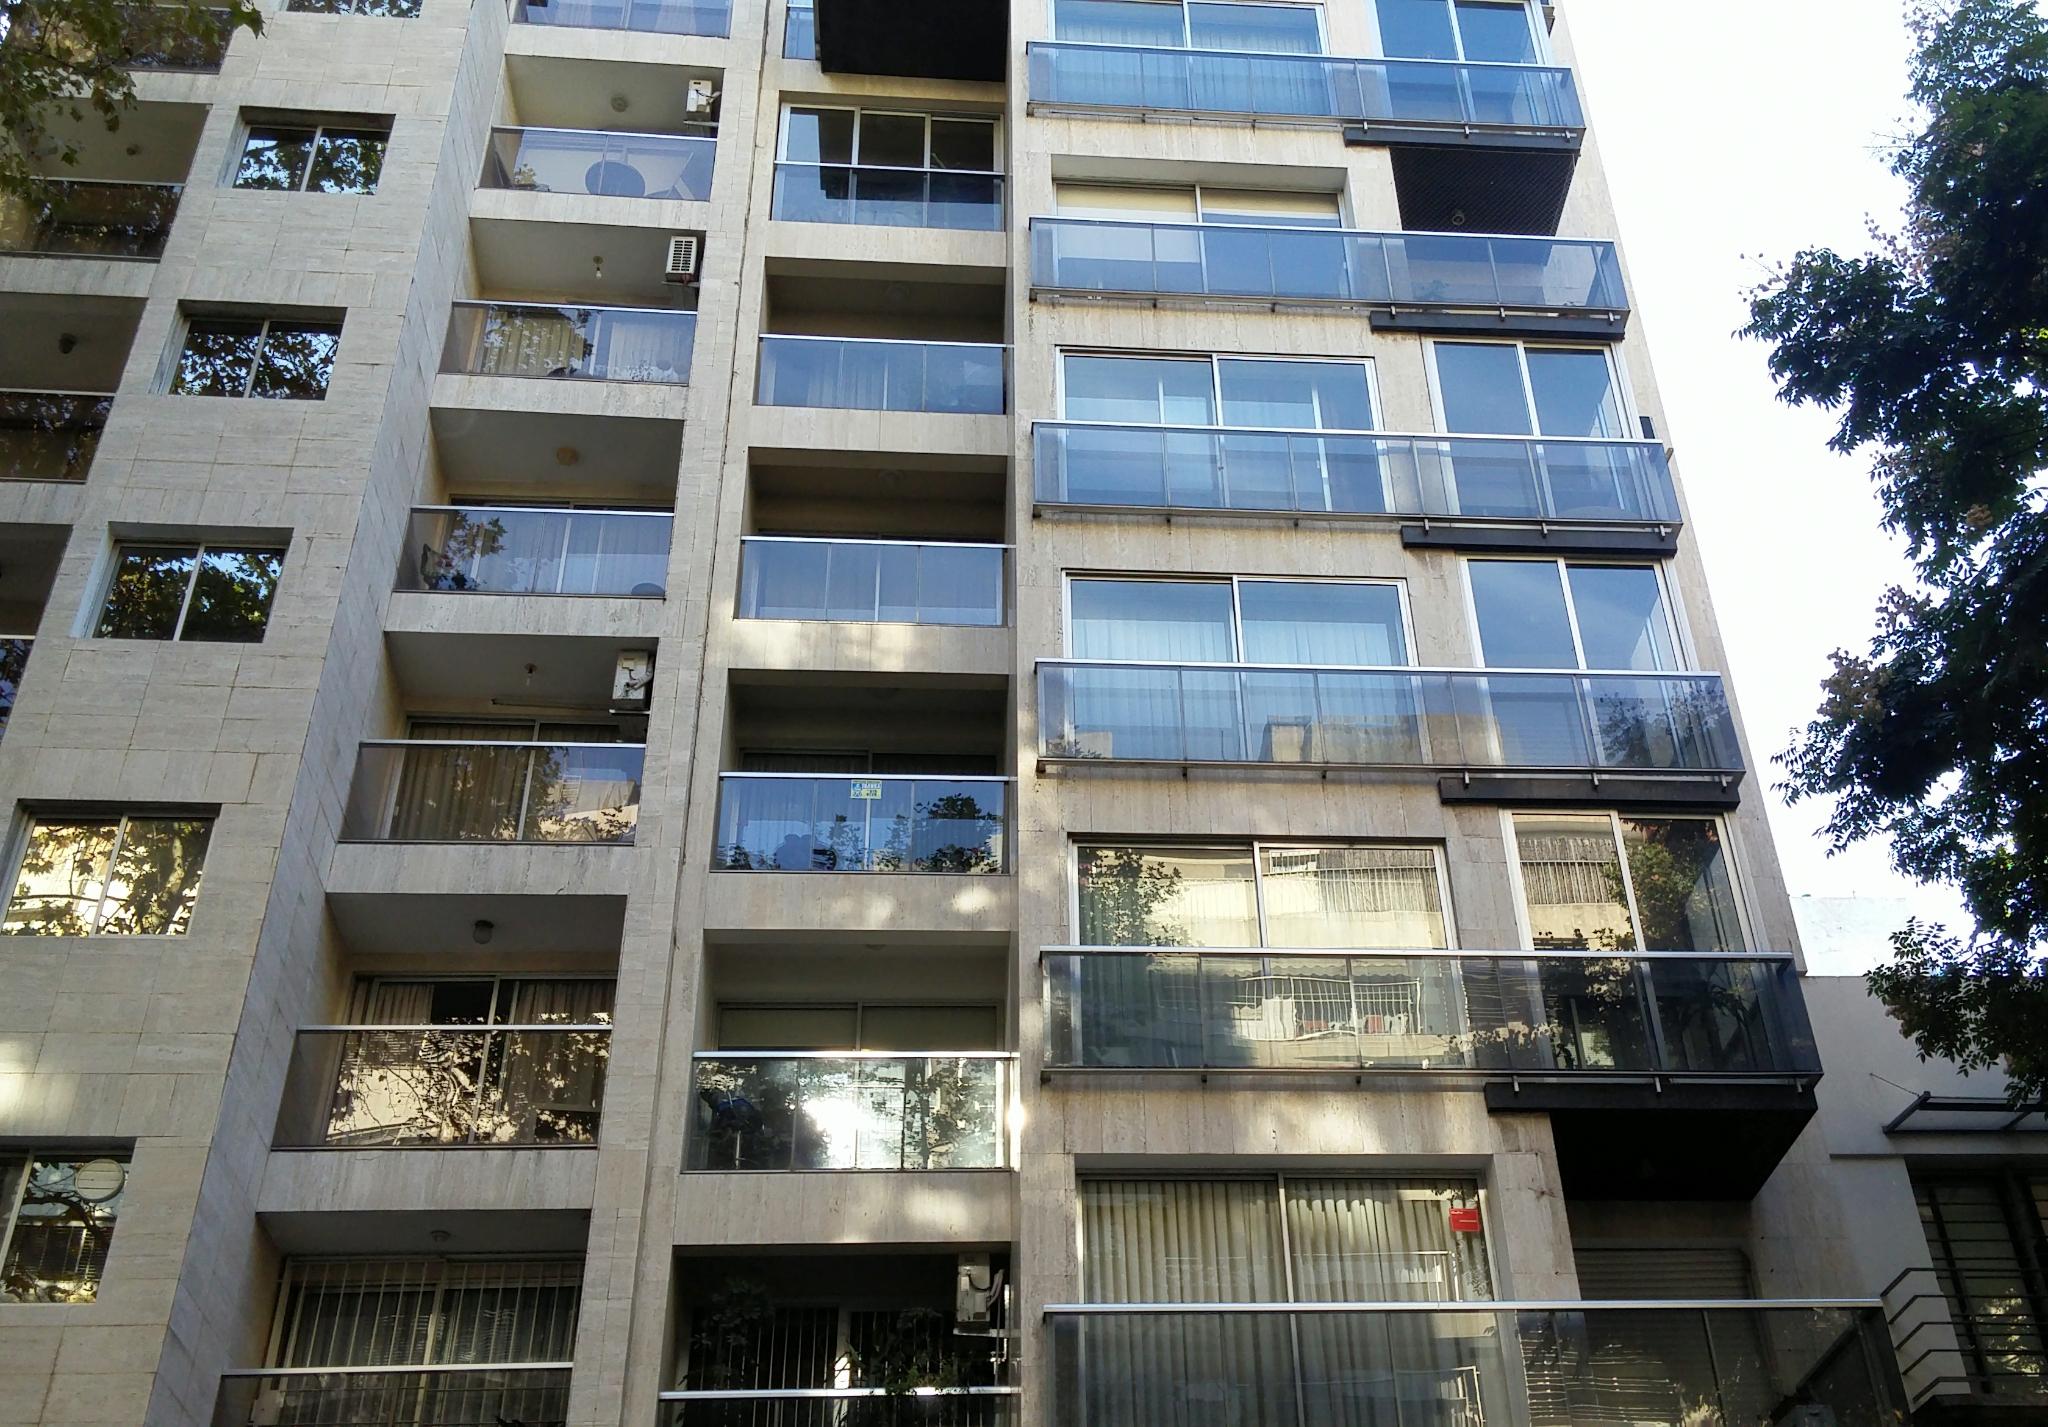 Alquiler - 1 Dormitorio - Chucarro Y Pereira - Pocitos